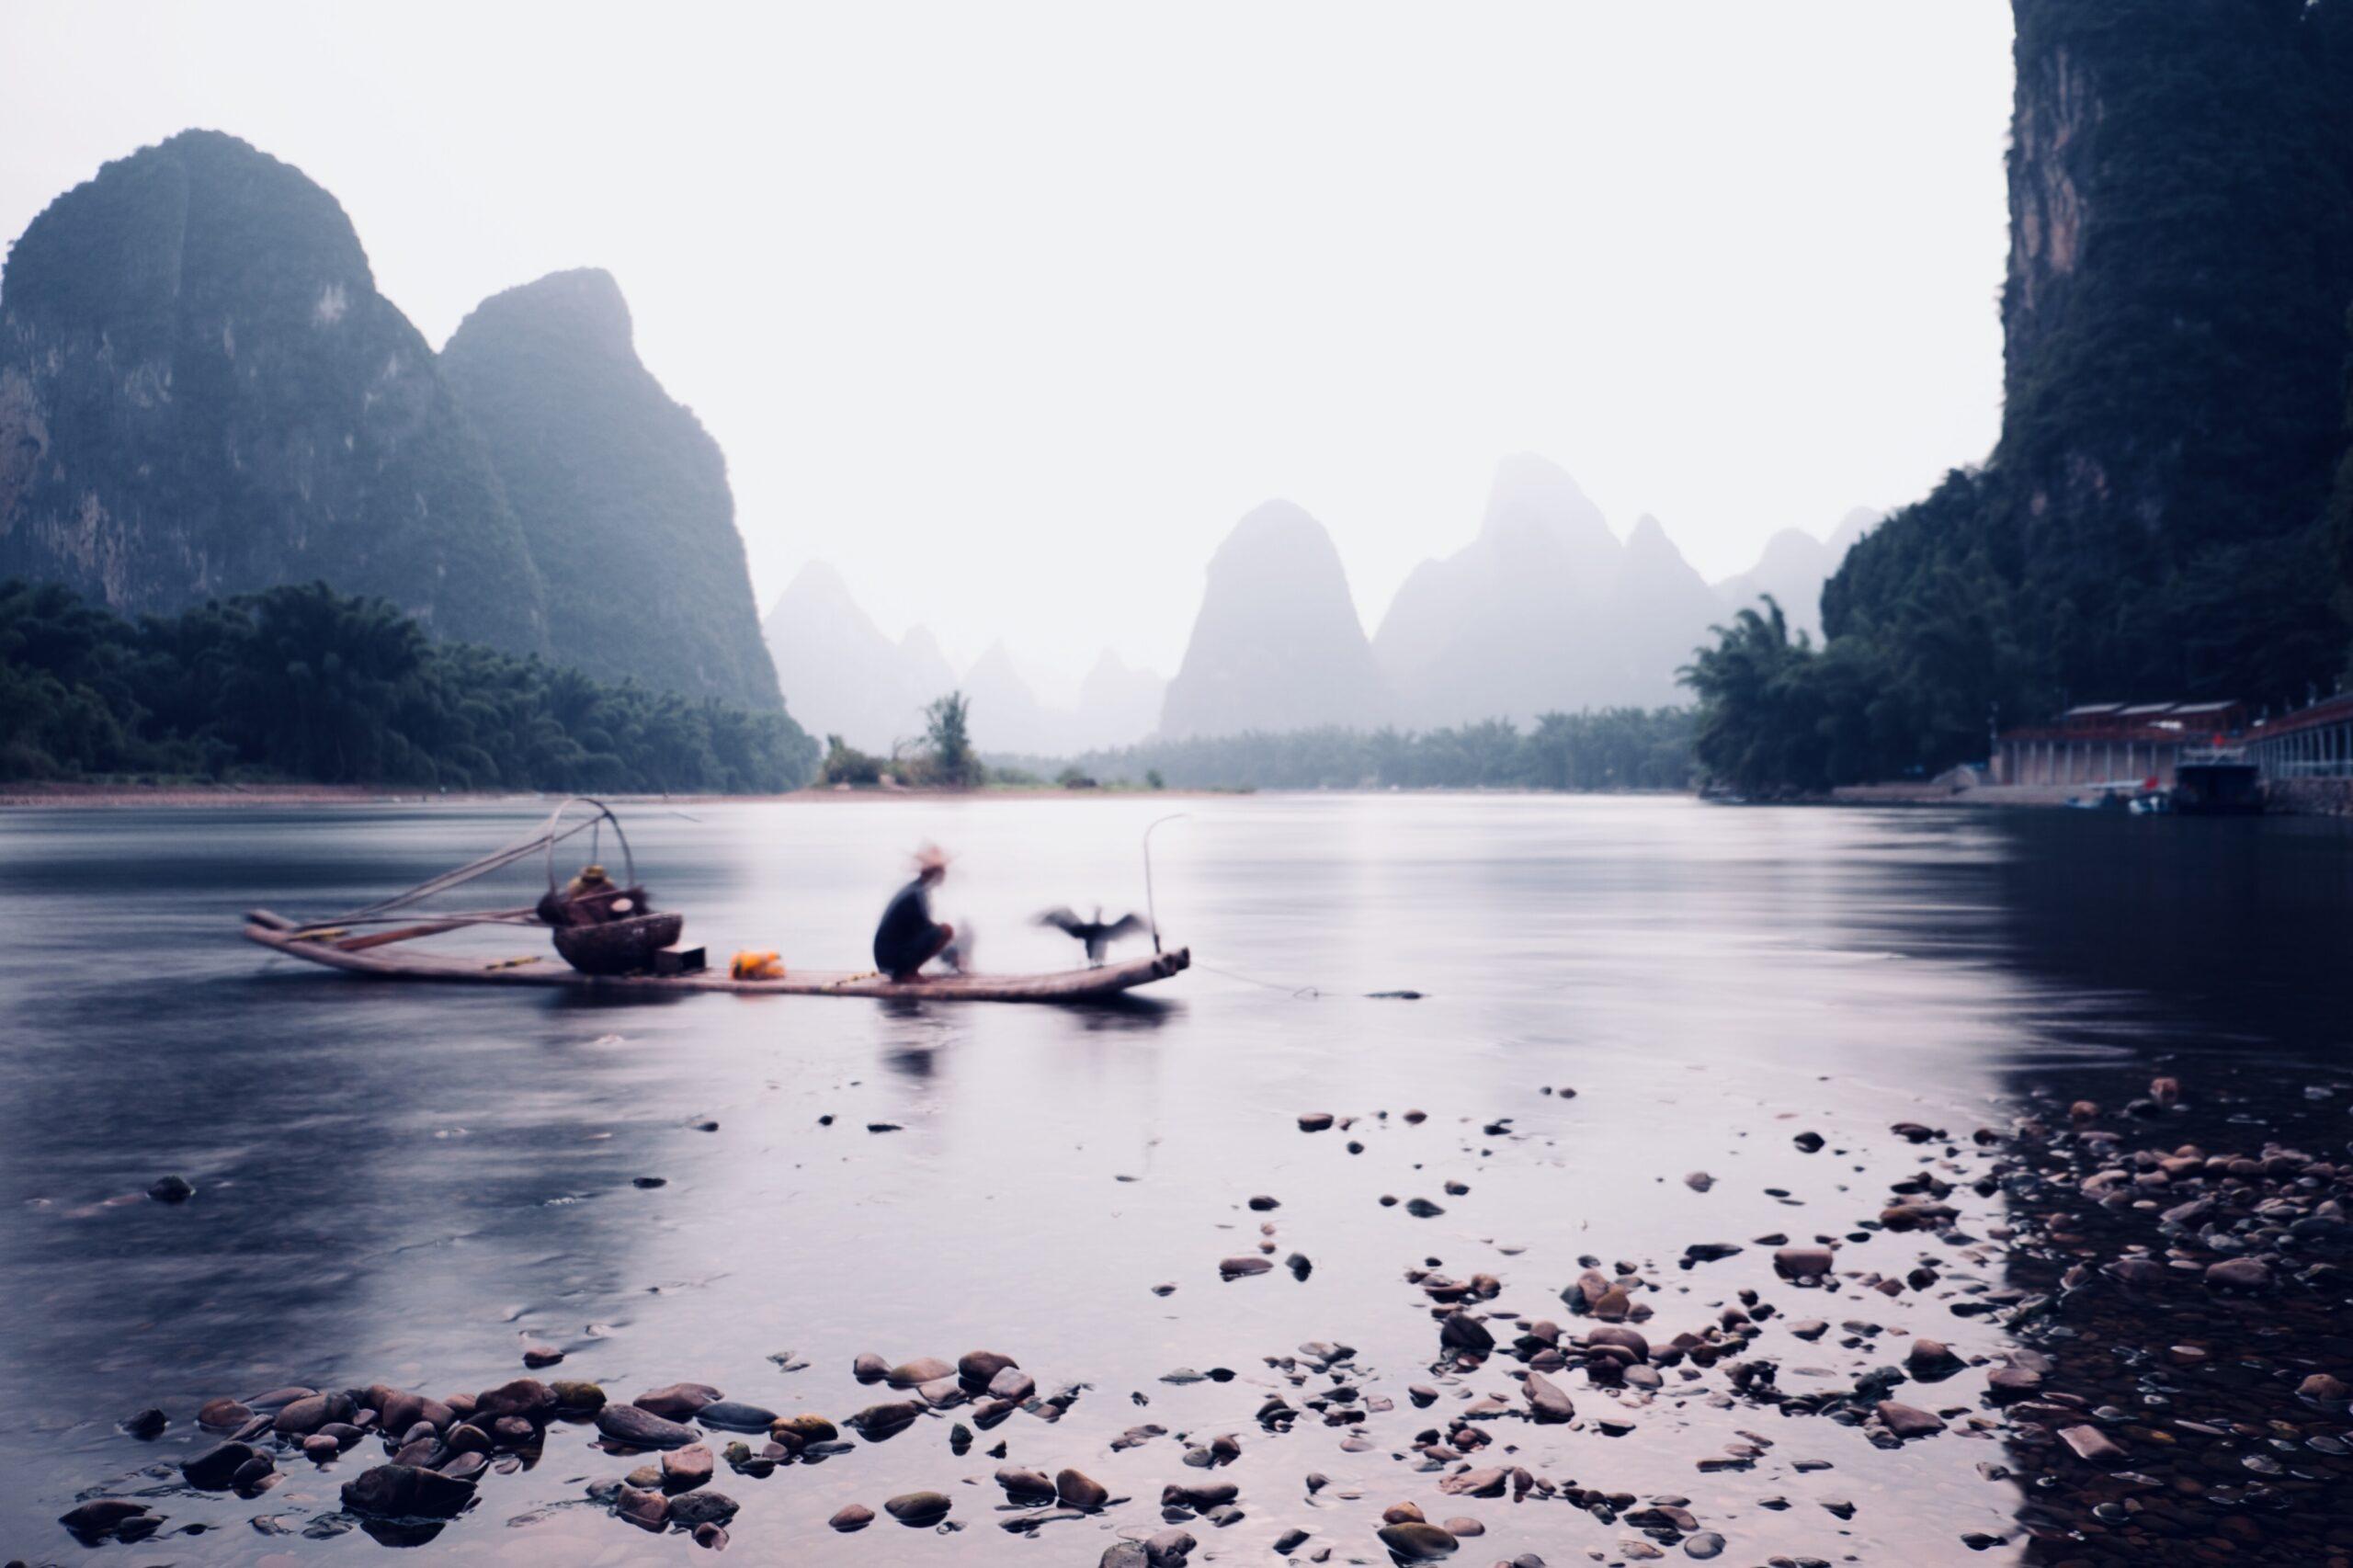 william-zhang-chinese fisherman early morning fishing in skiff-unsplash